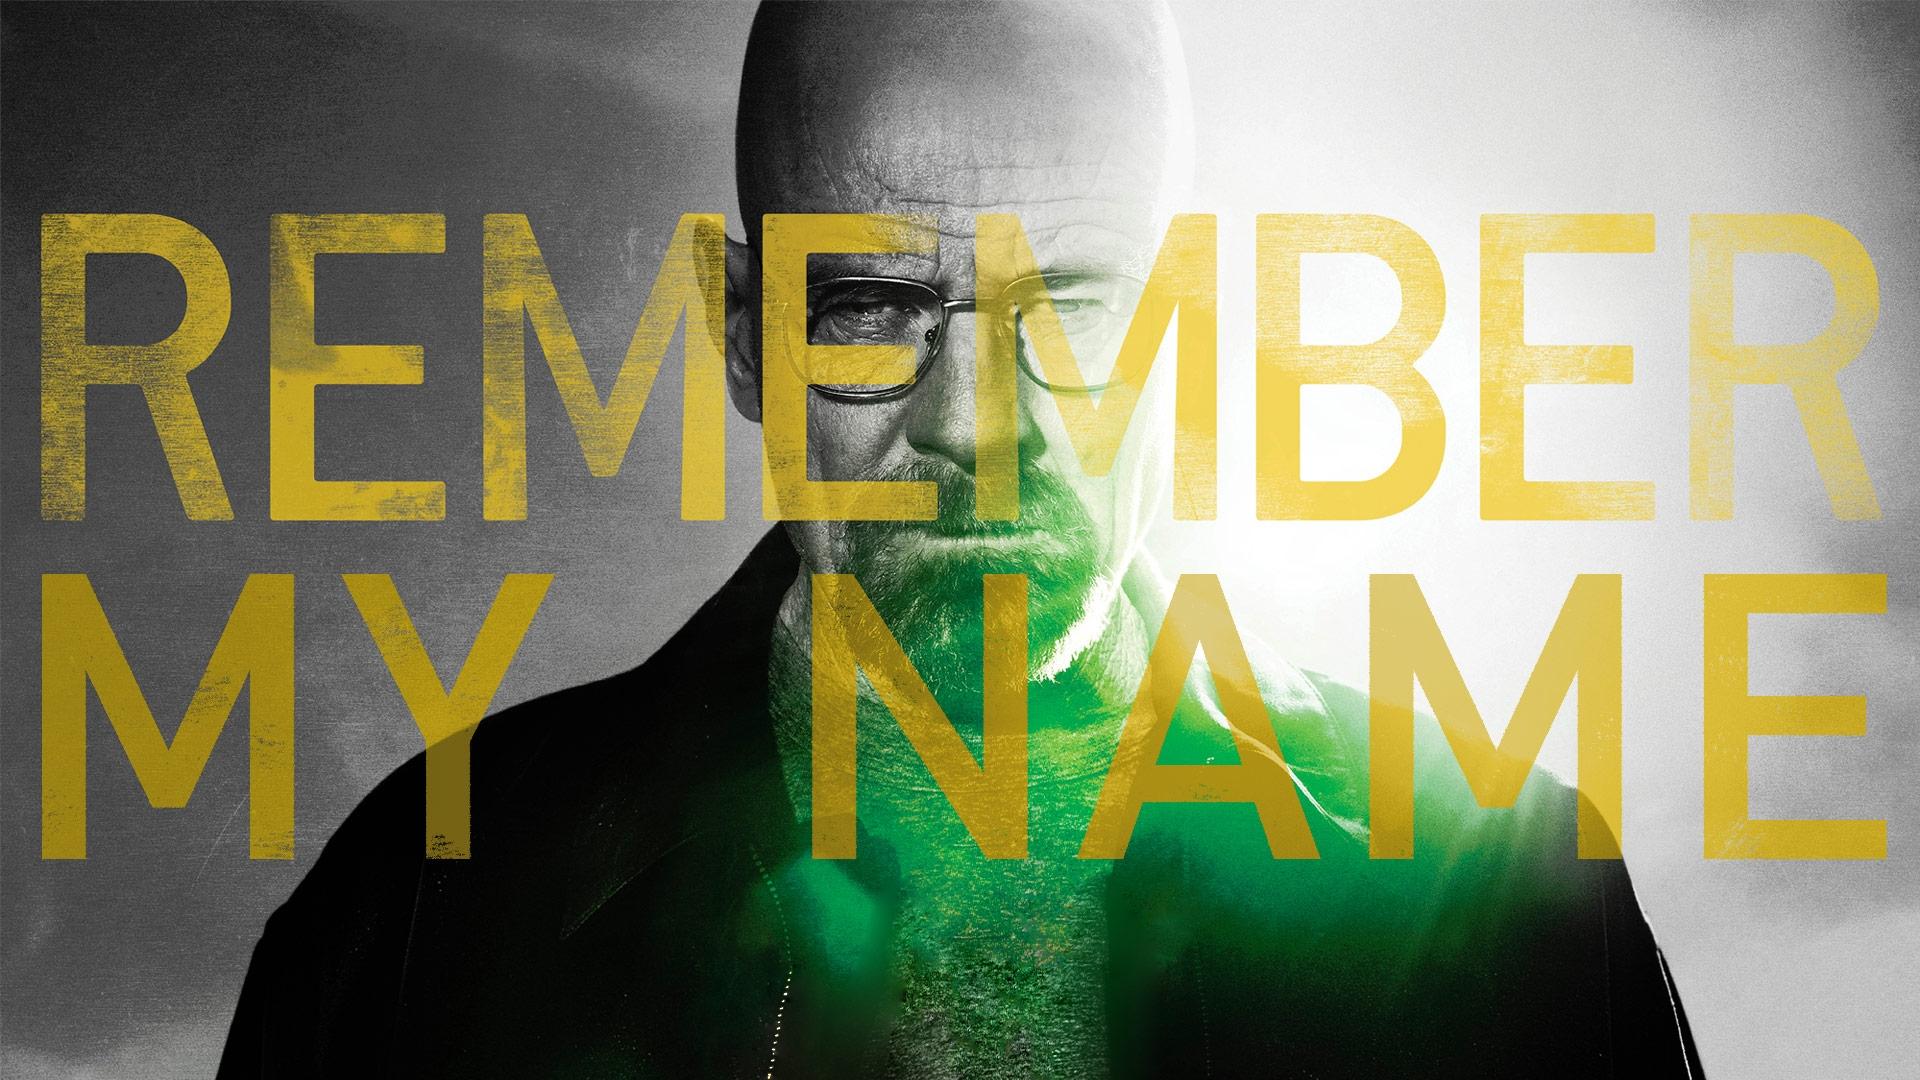 Remember My Name   Breaking Bad Wallpaper 1920x1080 729 1920x1080